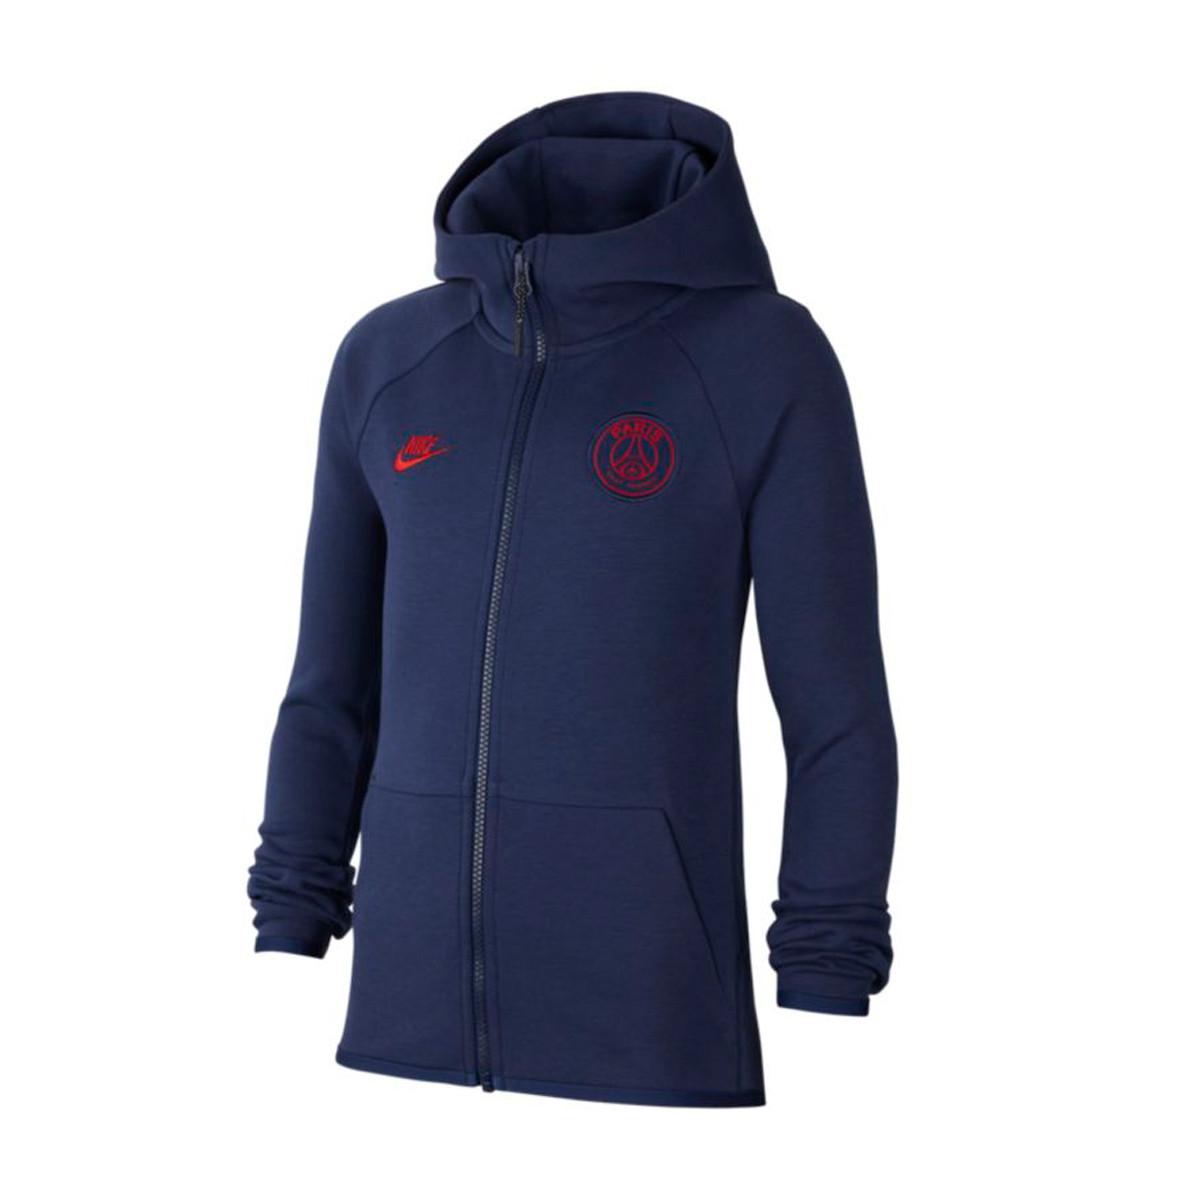 Jacket Nike Paris Saint Germain Nsw Tech Fleece Fz Essentials Cl 2019 2020 Nino Midnight Navy University Red Football Store Futbol Emotion